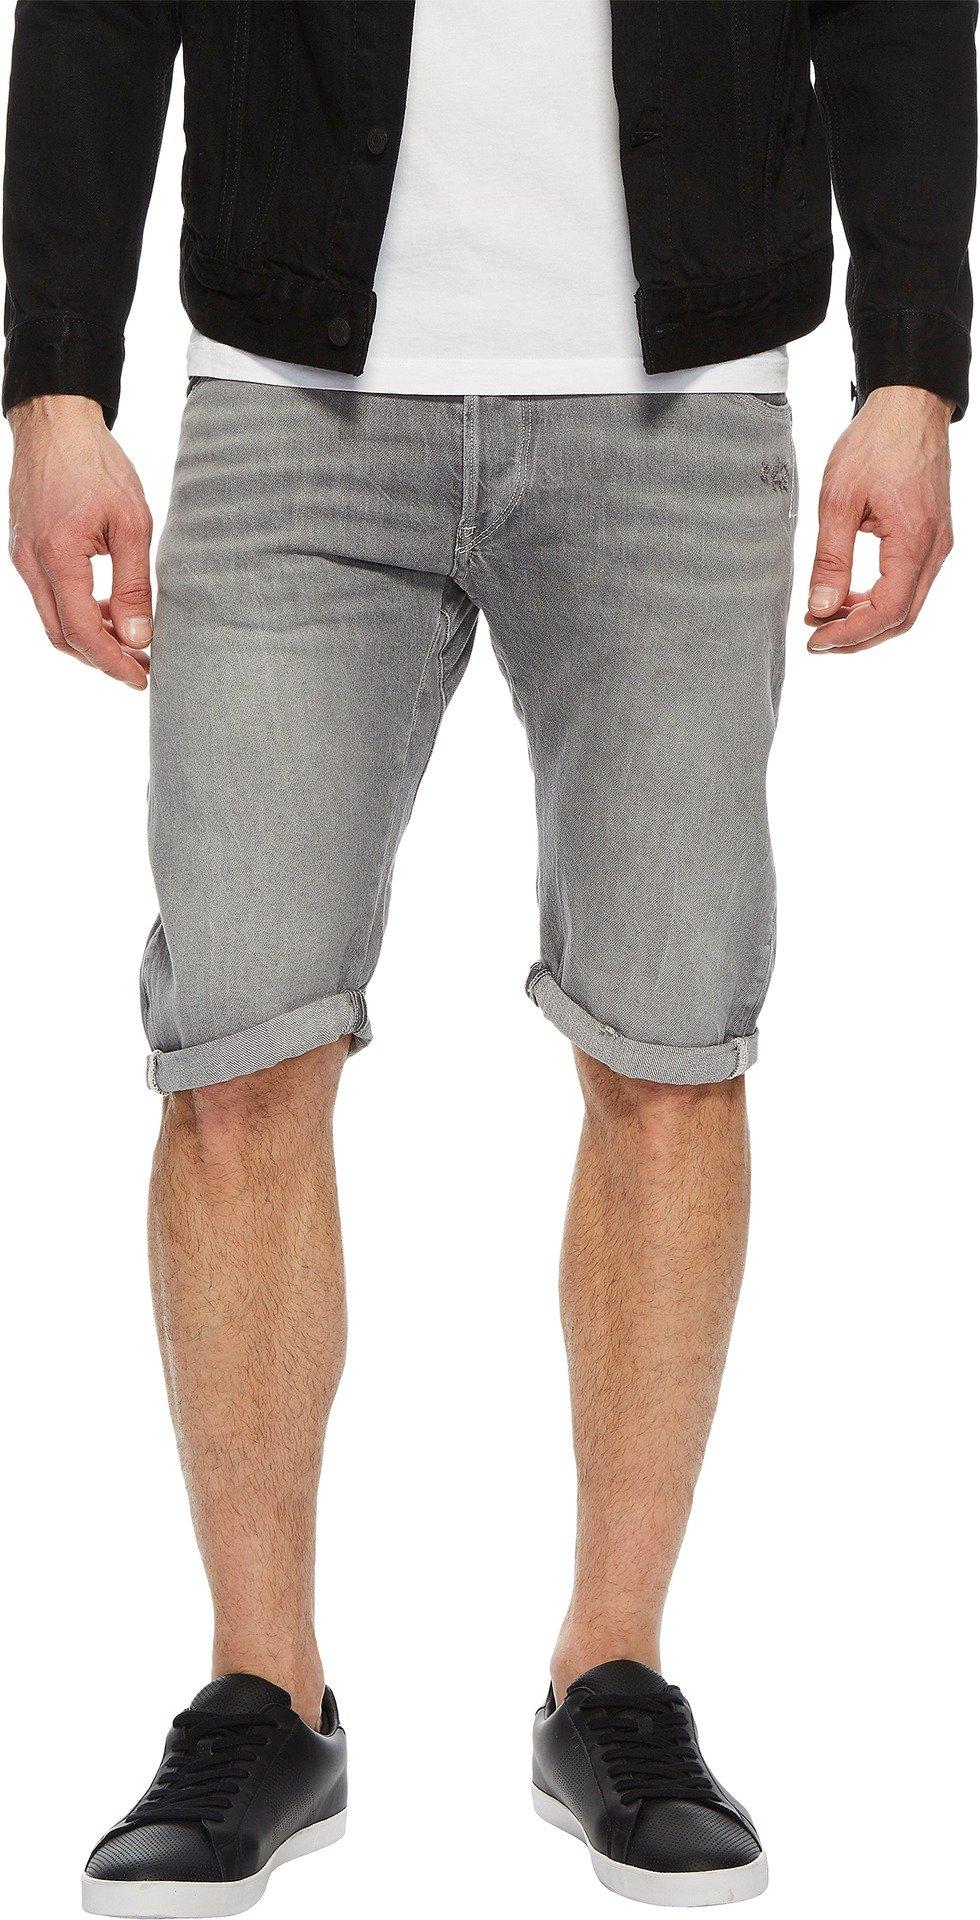 G-Star Men's Arc 3D 1/2 Shorts In RACHA Grey Denim RACHA Grey Denim 36